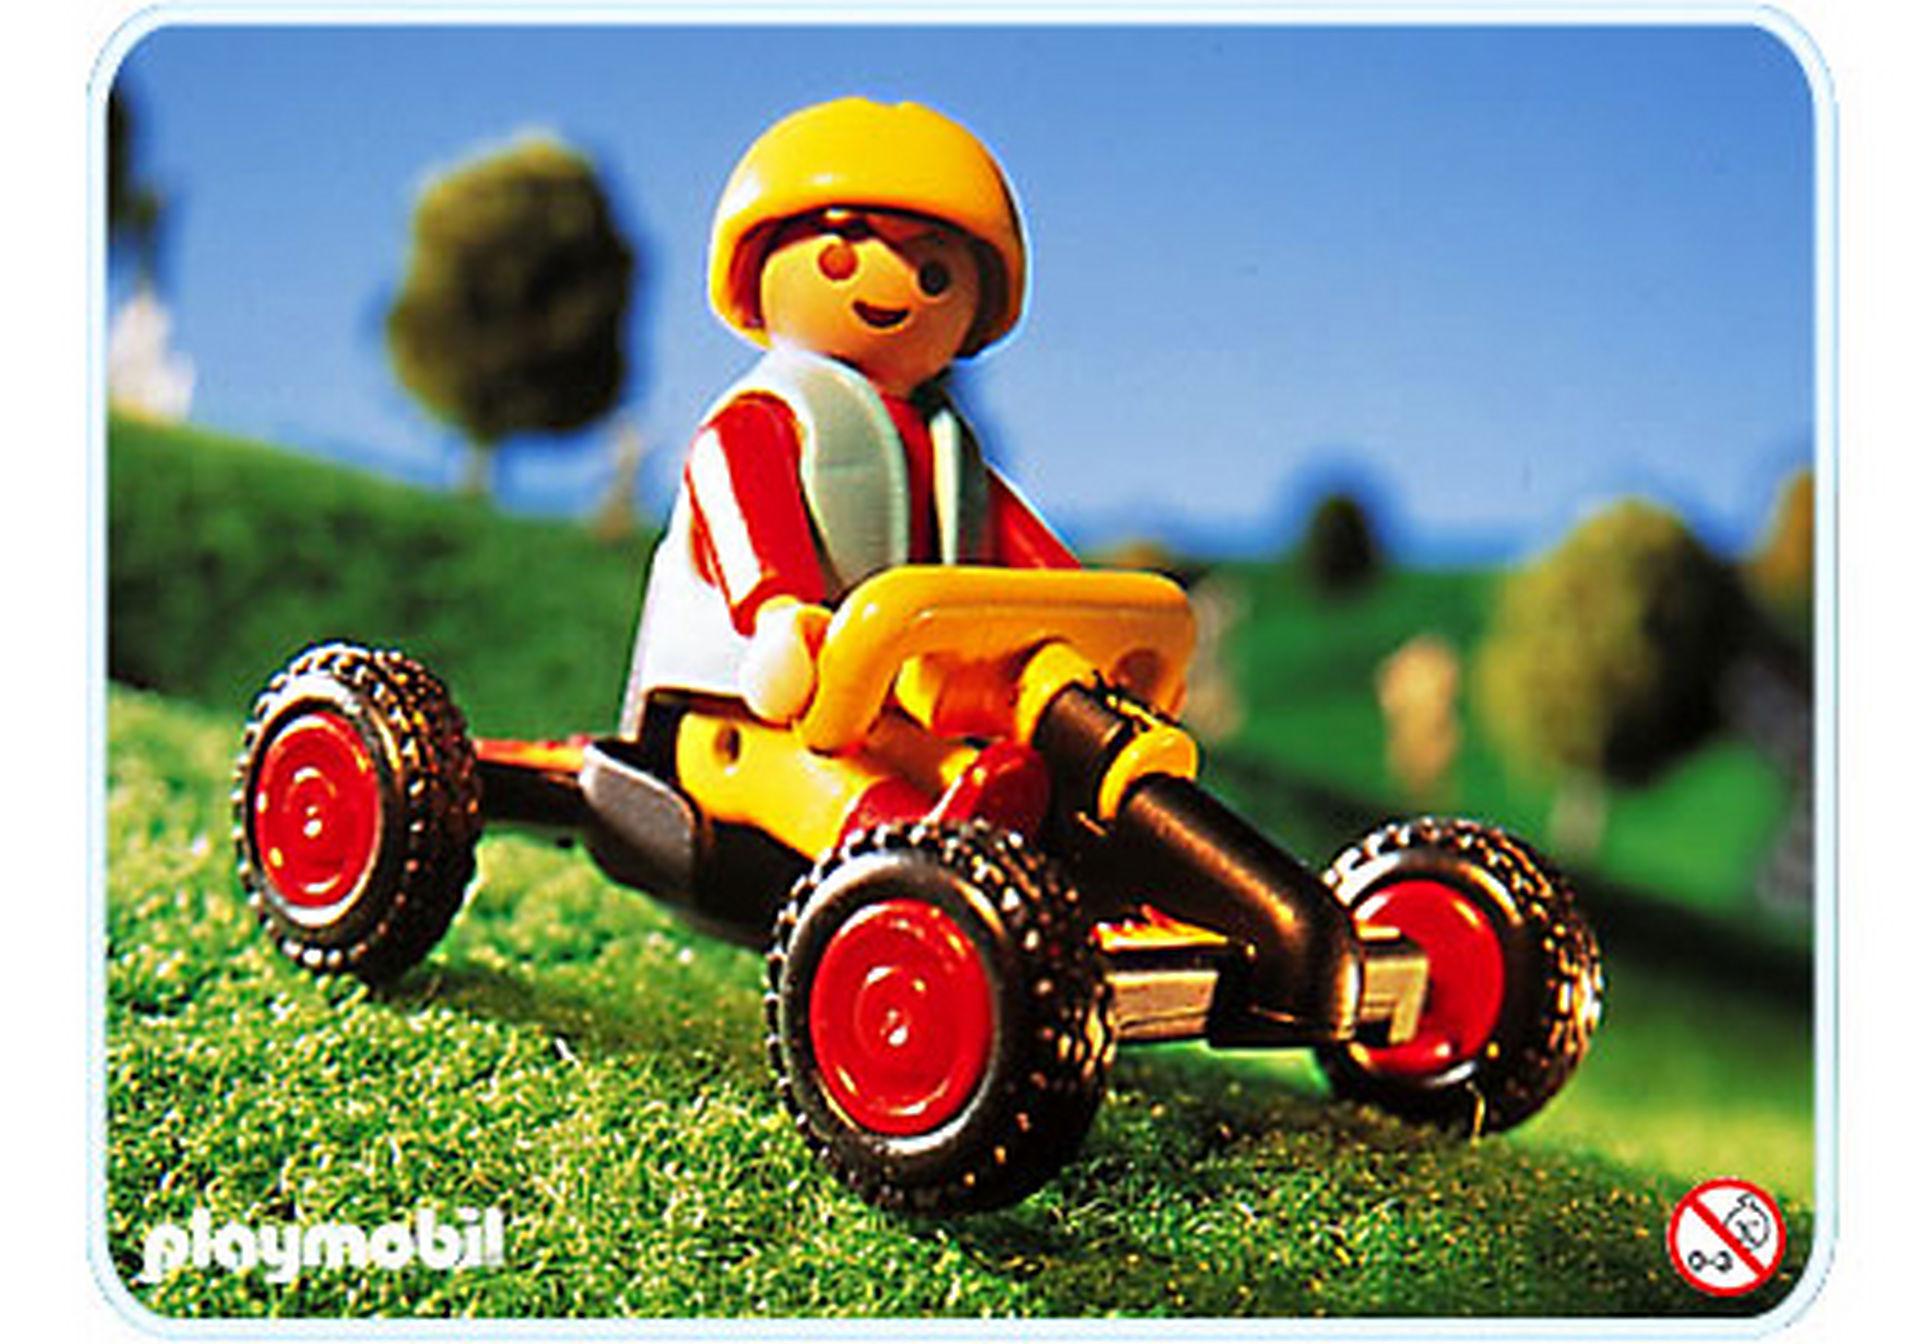 4510-A Junge mit Kettcar zoom image1